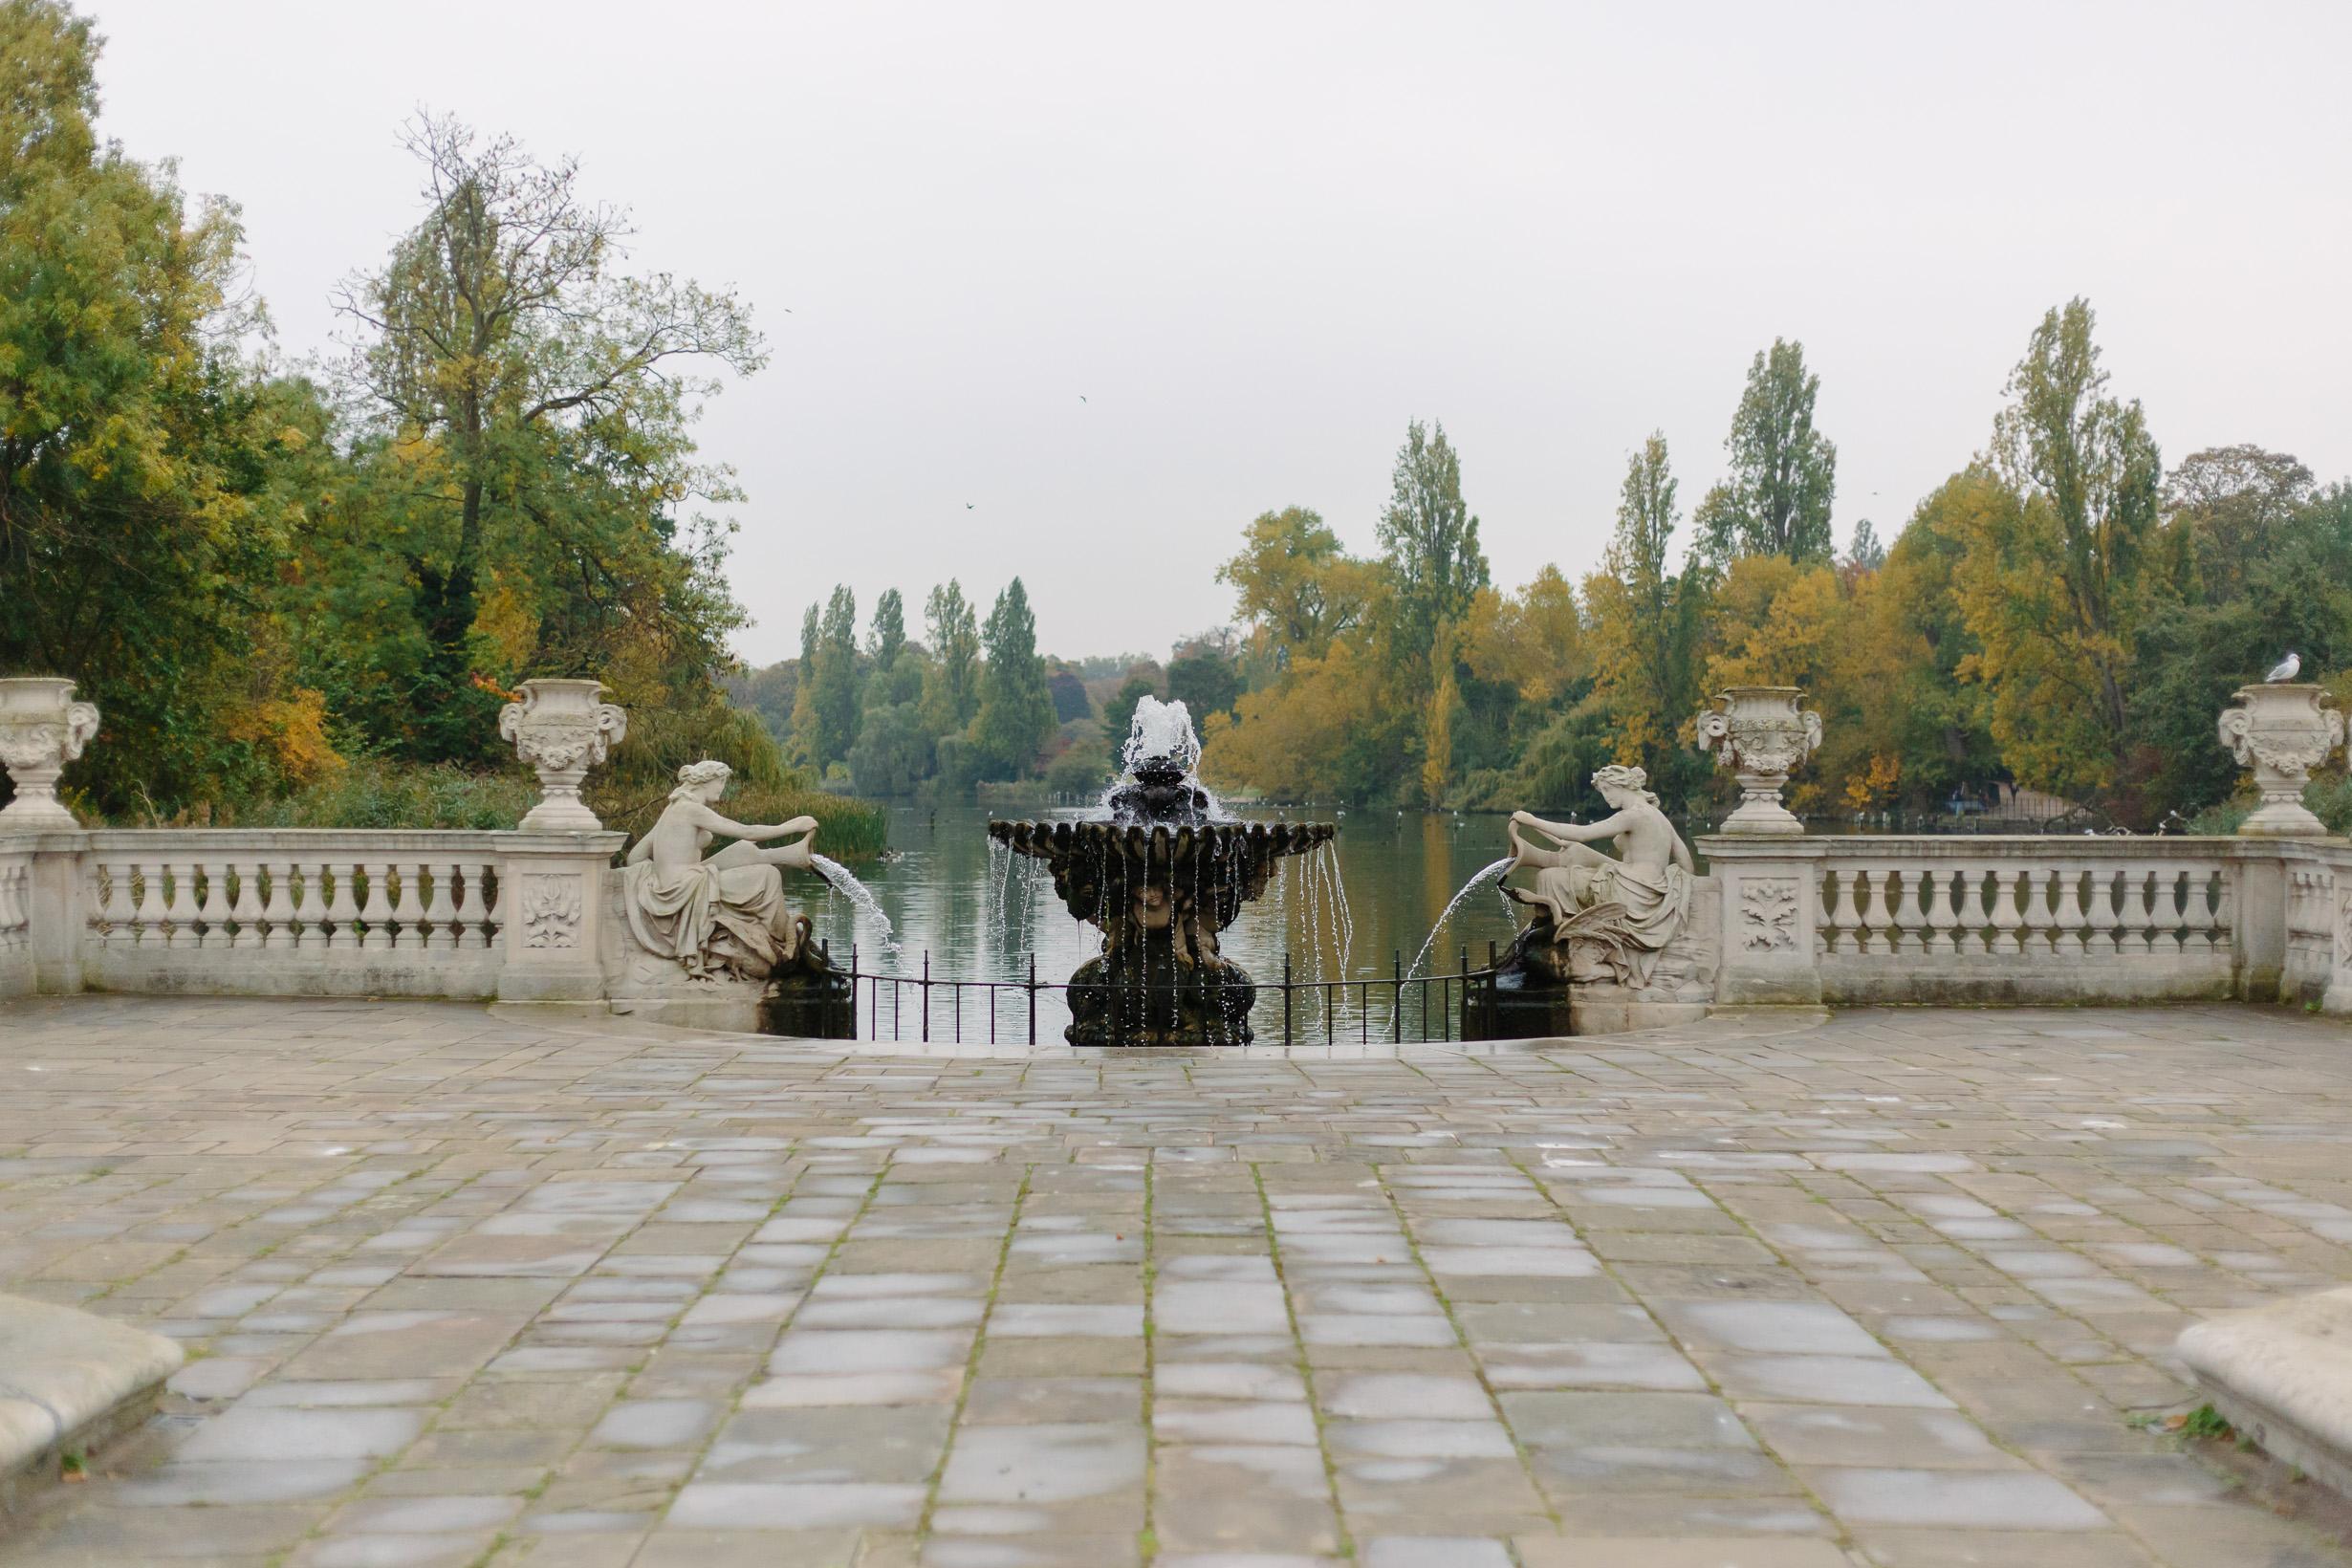 fall-in-hyde-park-london-4153